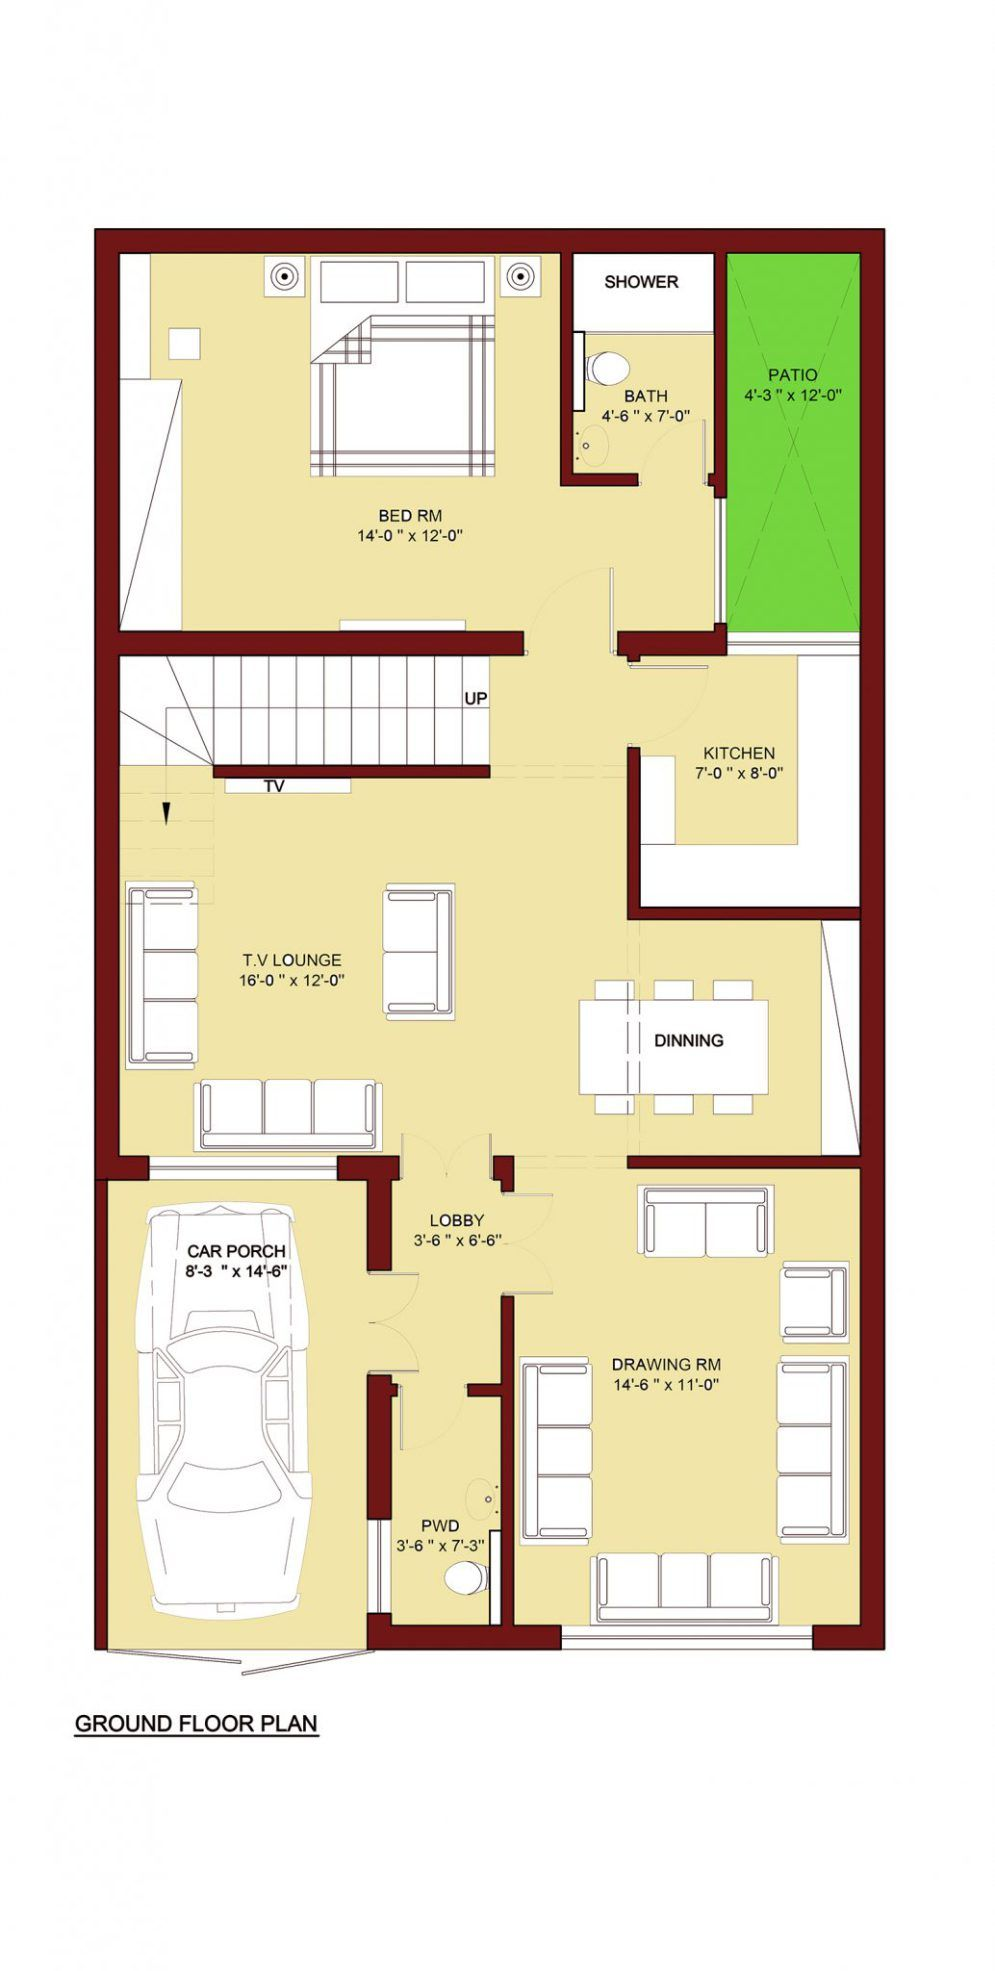 House Floor Plan Architecture Pinterest